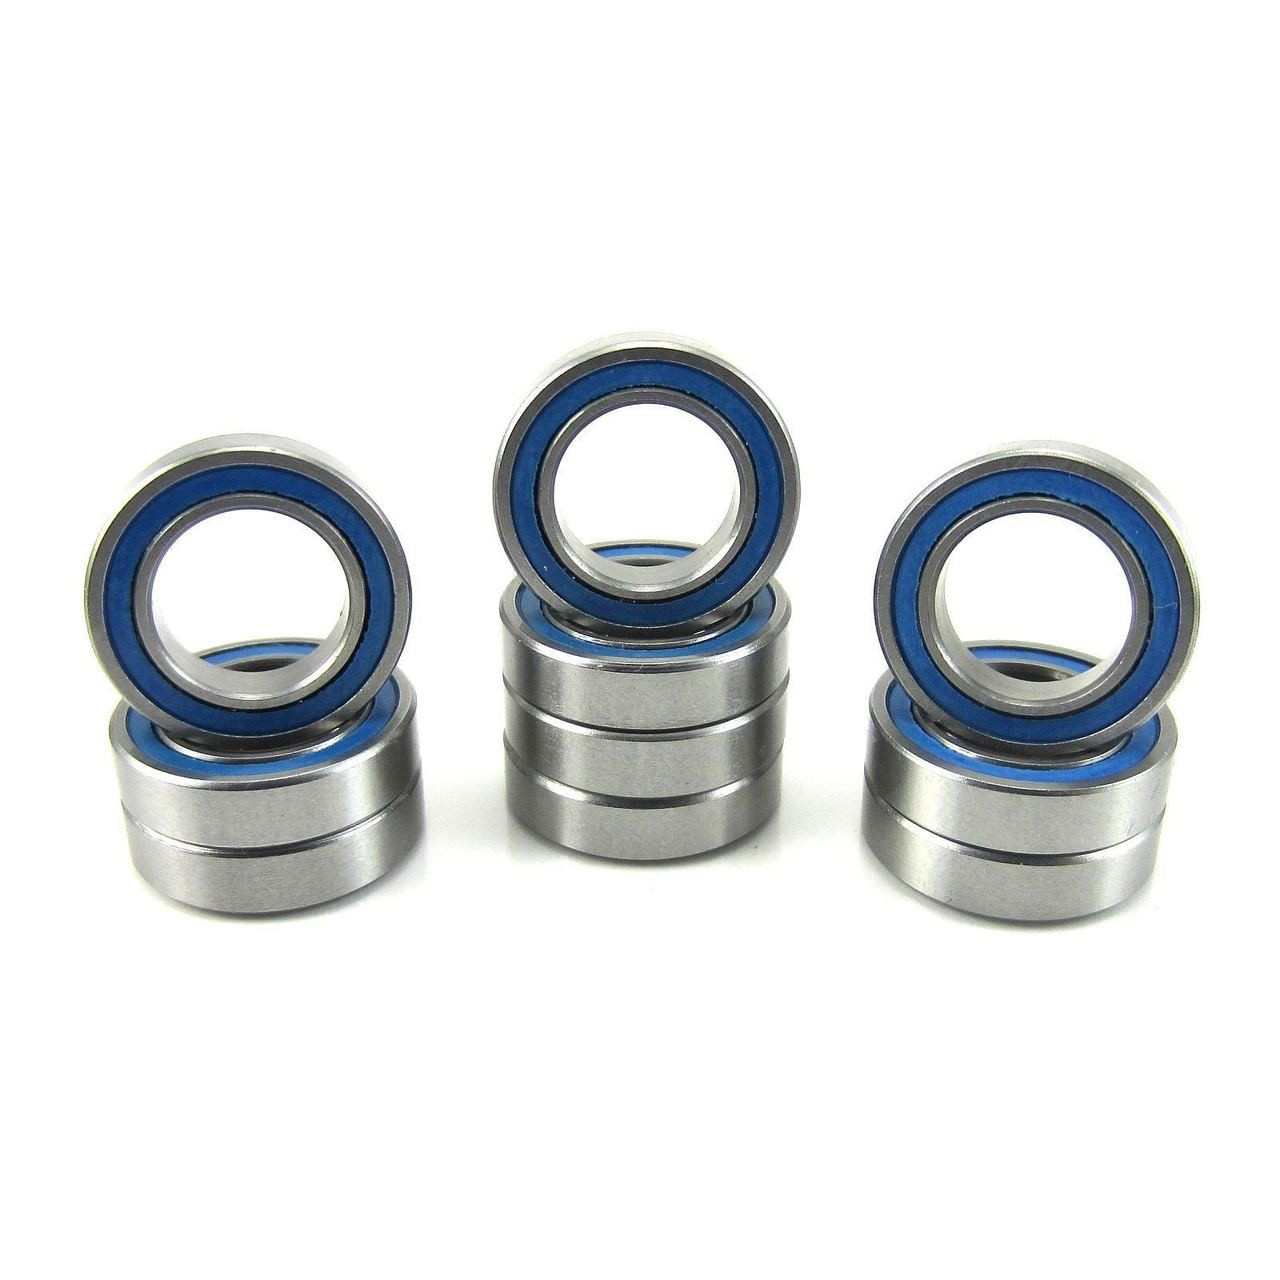 TRB RC 3/8x5/8x5/32 Precision Ball Bearings ABEC 3 BLU Rubber Sealed (10)